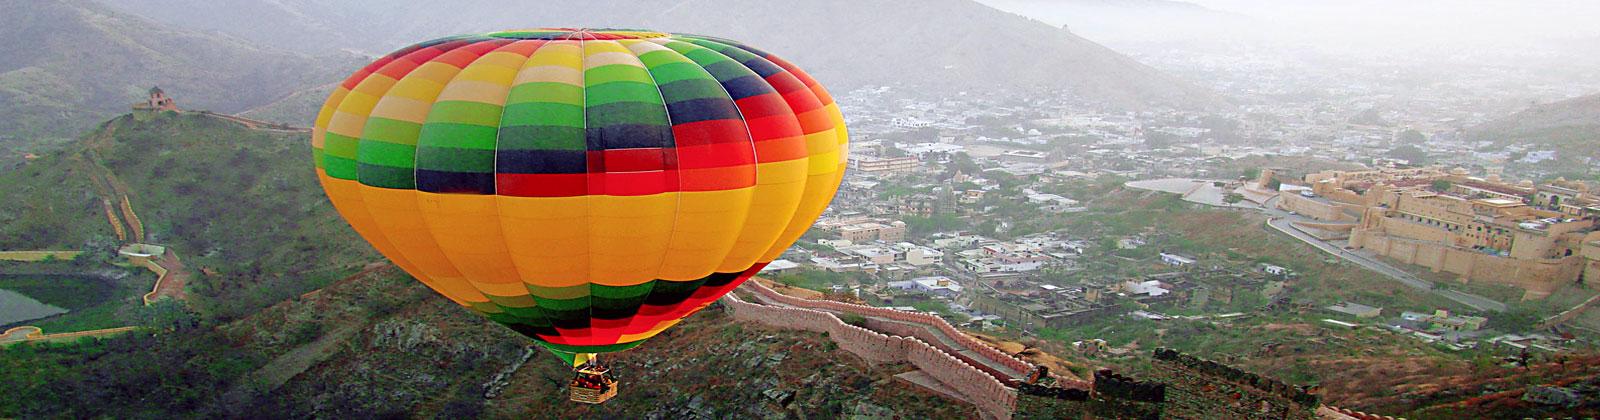 hot air balloon in manali